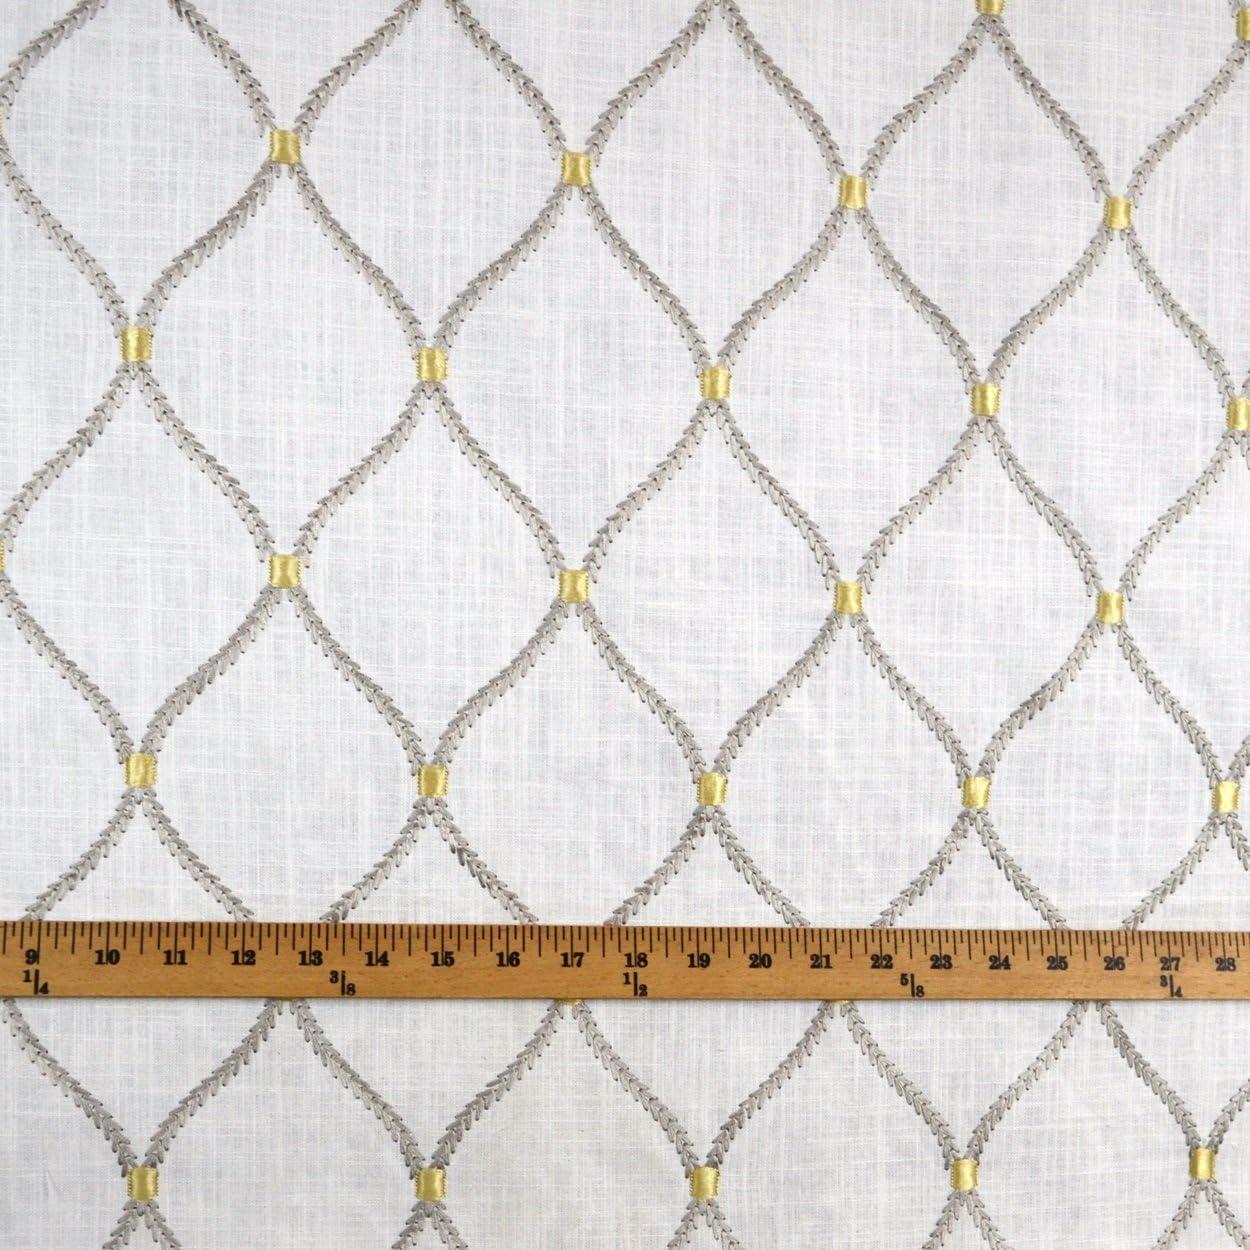 Deane Embroidery Smoke Wavely Linen Trellis Fabric